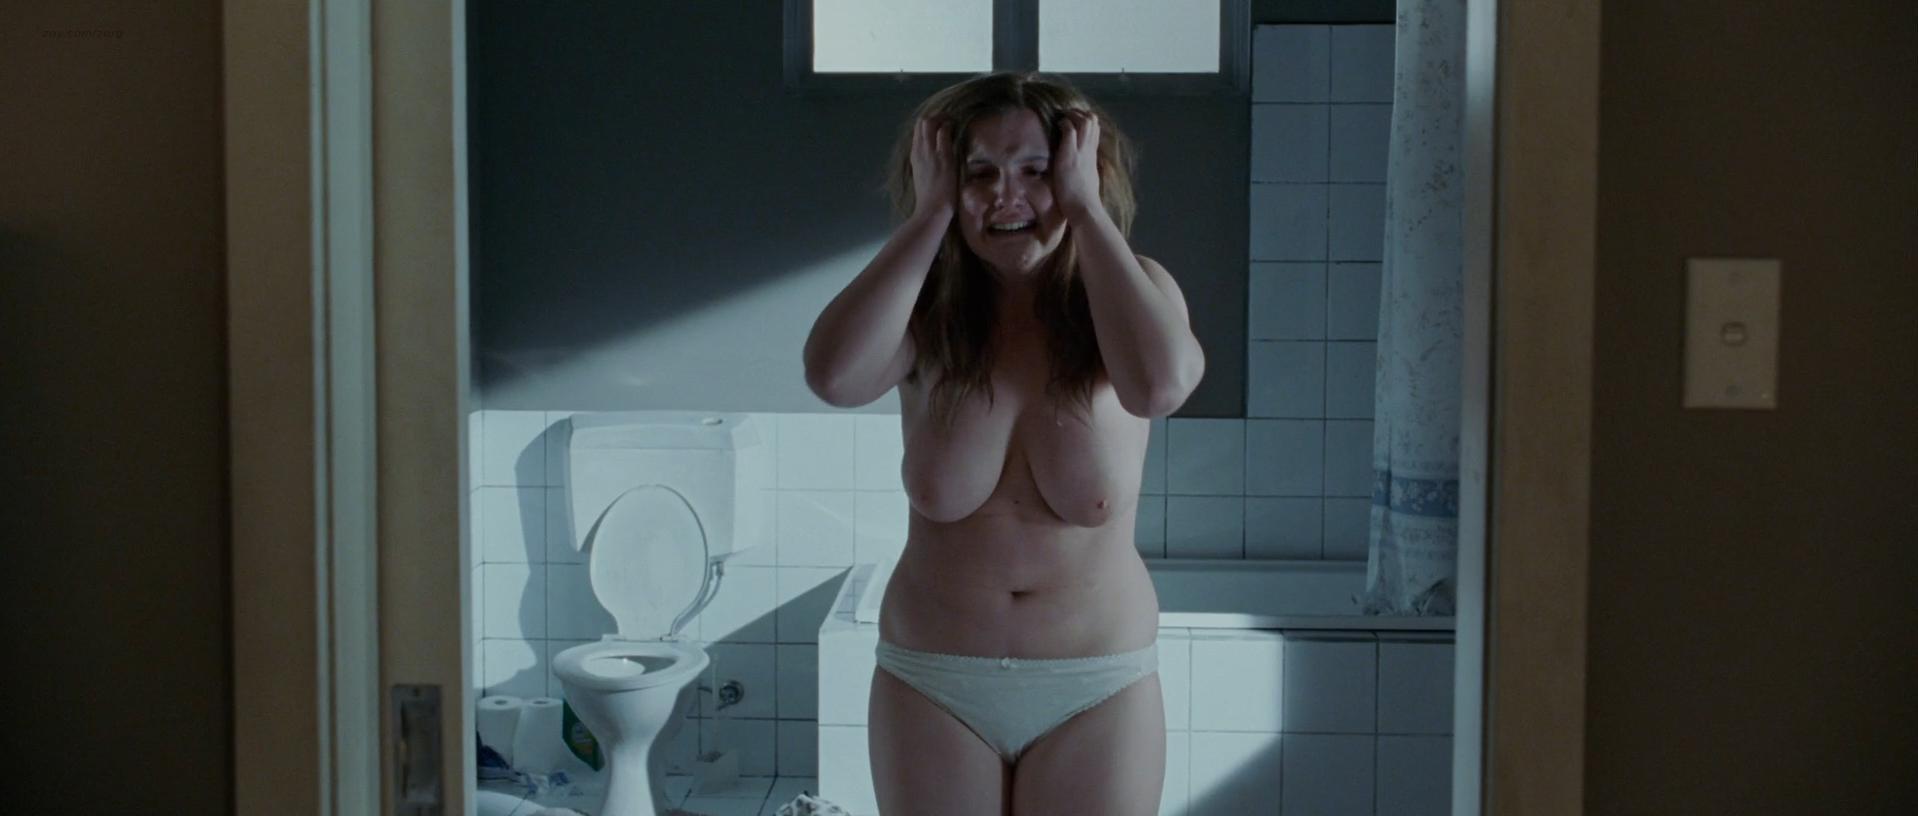 Kate Bell nude, Ruth Bradley nude, Miranda Otto nude - In Her Skin (2009)